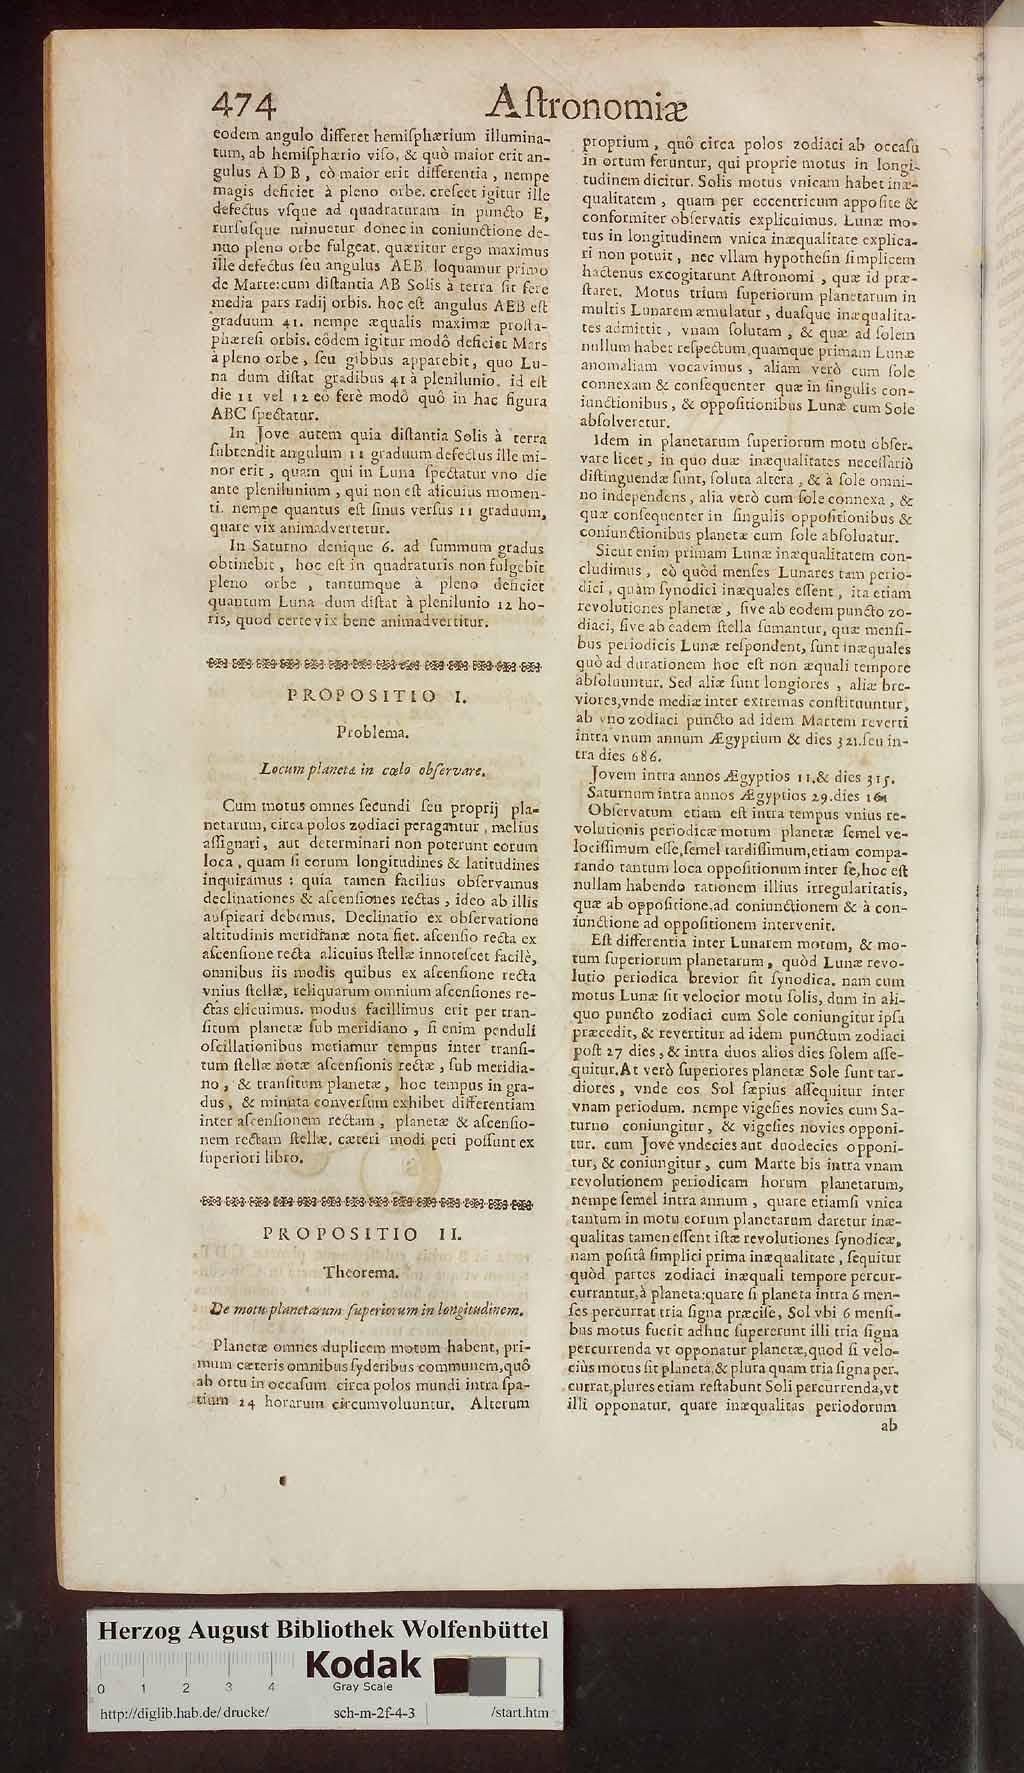 http://diglib.hab.de/drucke/sch-m-2f-4-3/00514.jpg